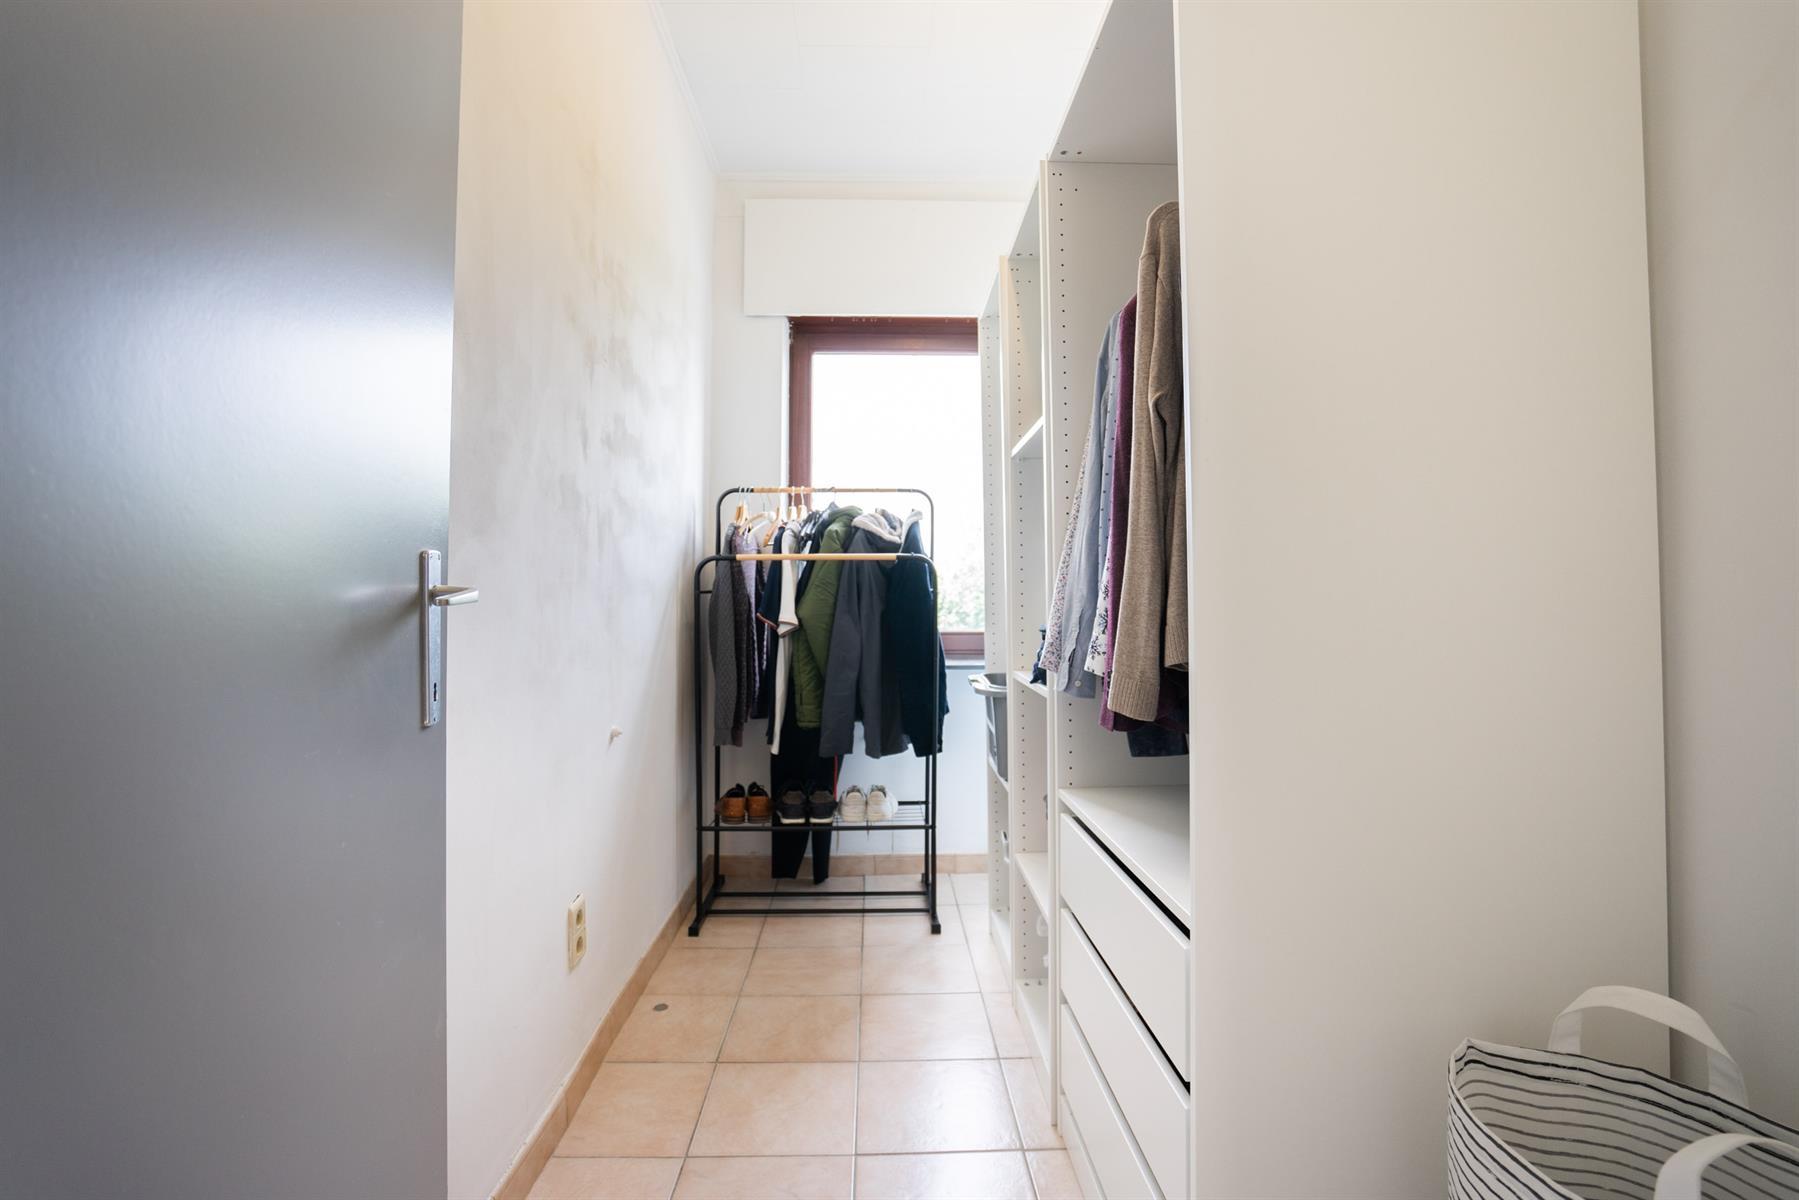 Maison - Beyne-Heusay Bellaire - #4422118-13